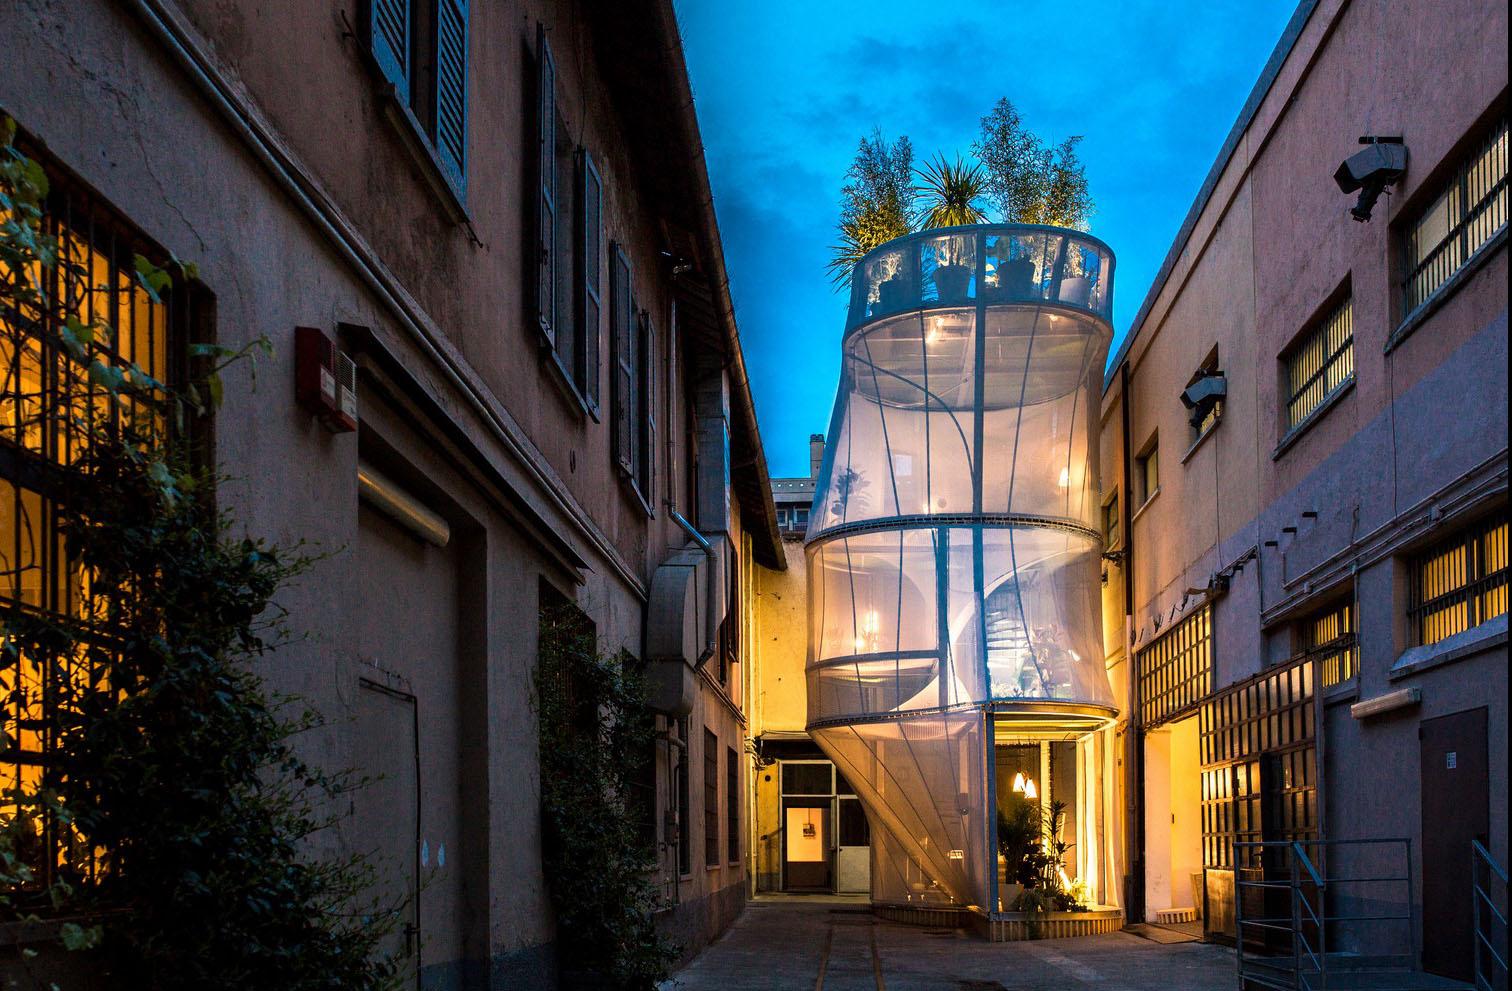 Location in zona tortona milano space makers for Design week milano 2017